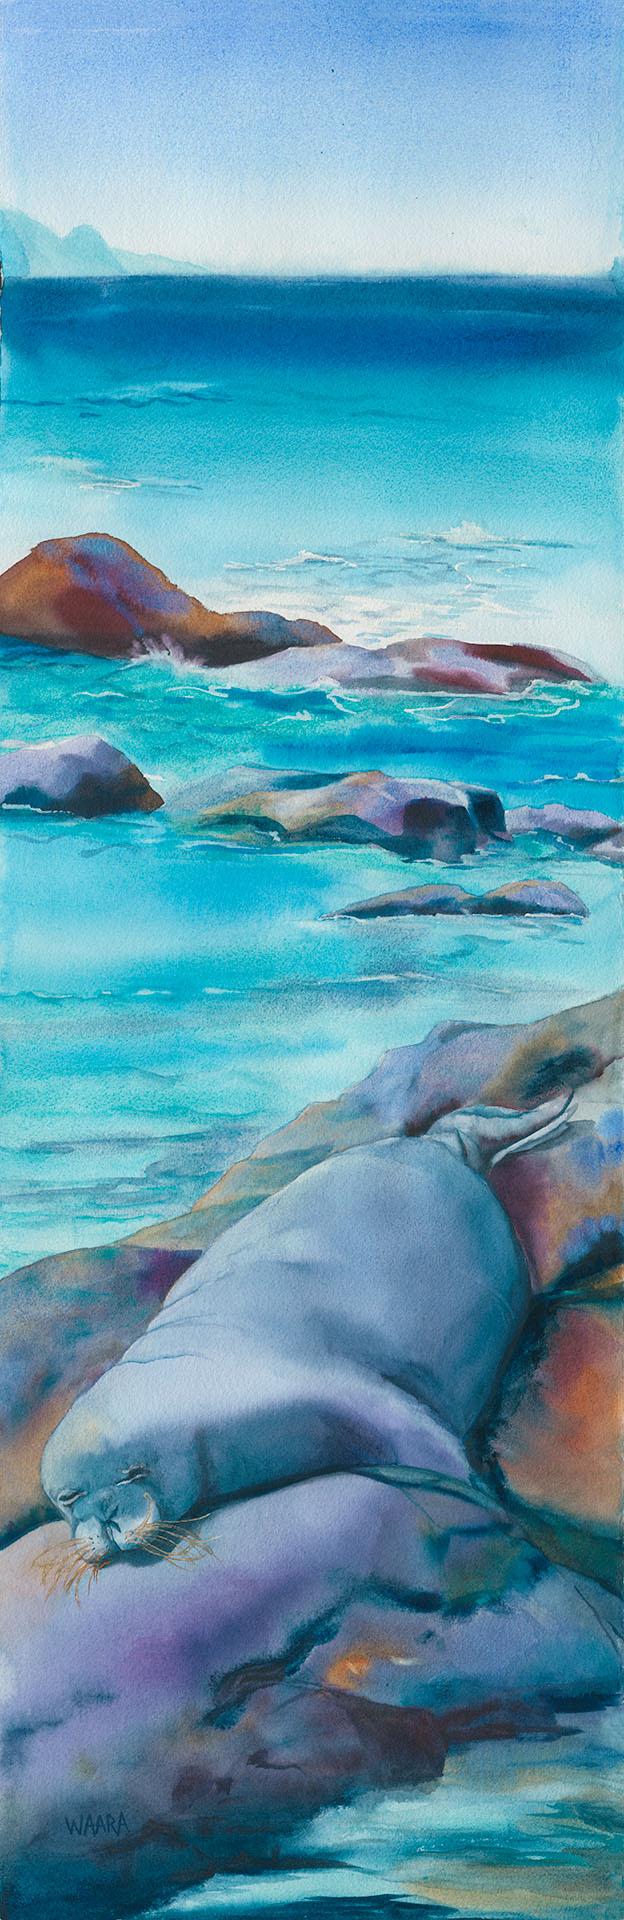 'Ilioholoikauaua watercolor painting of monk seal